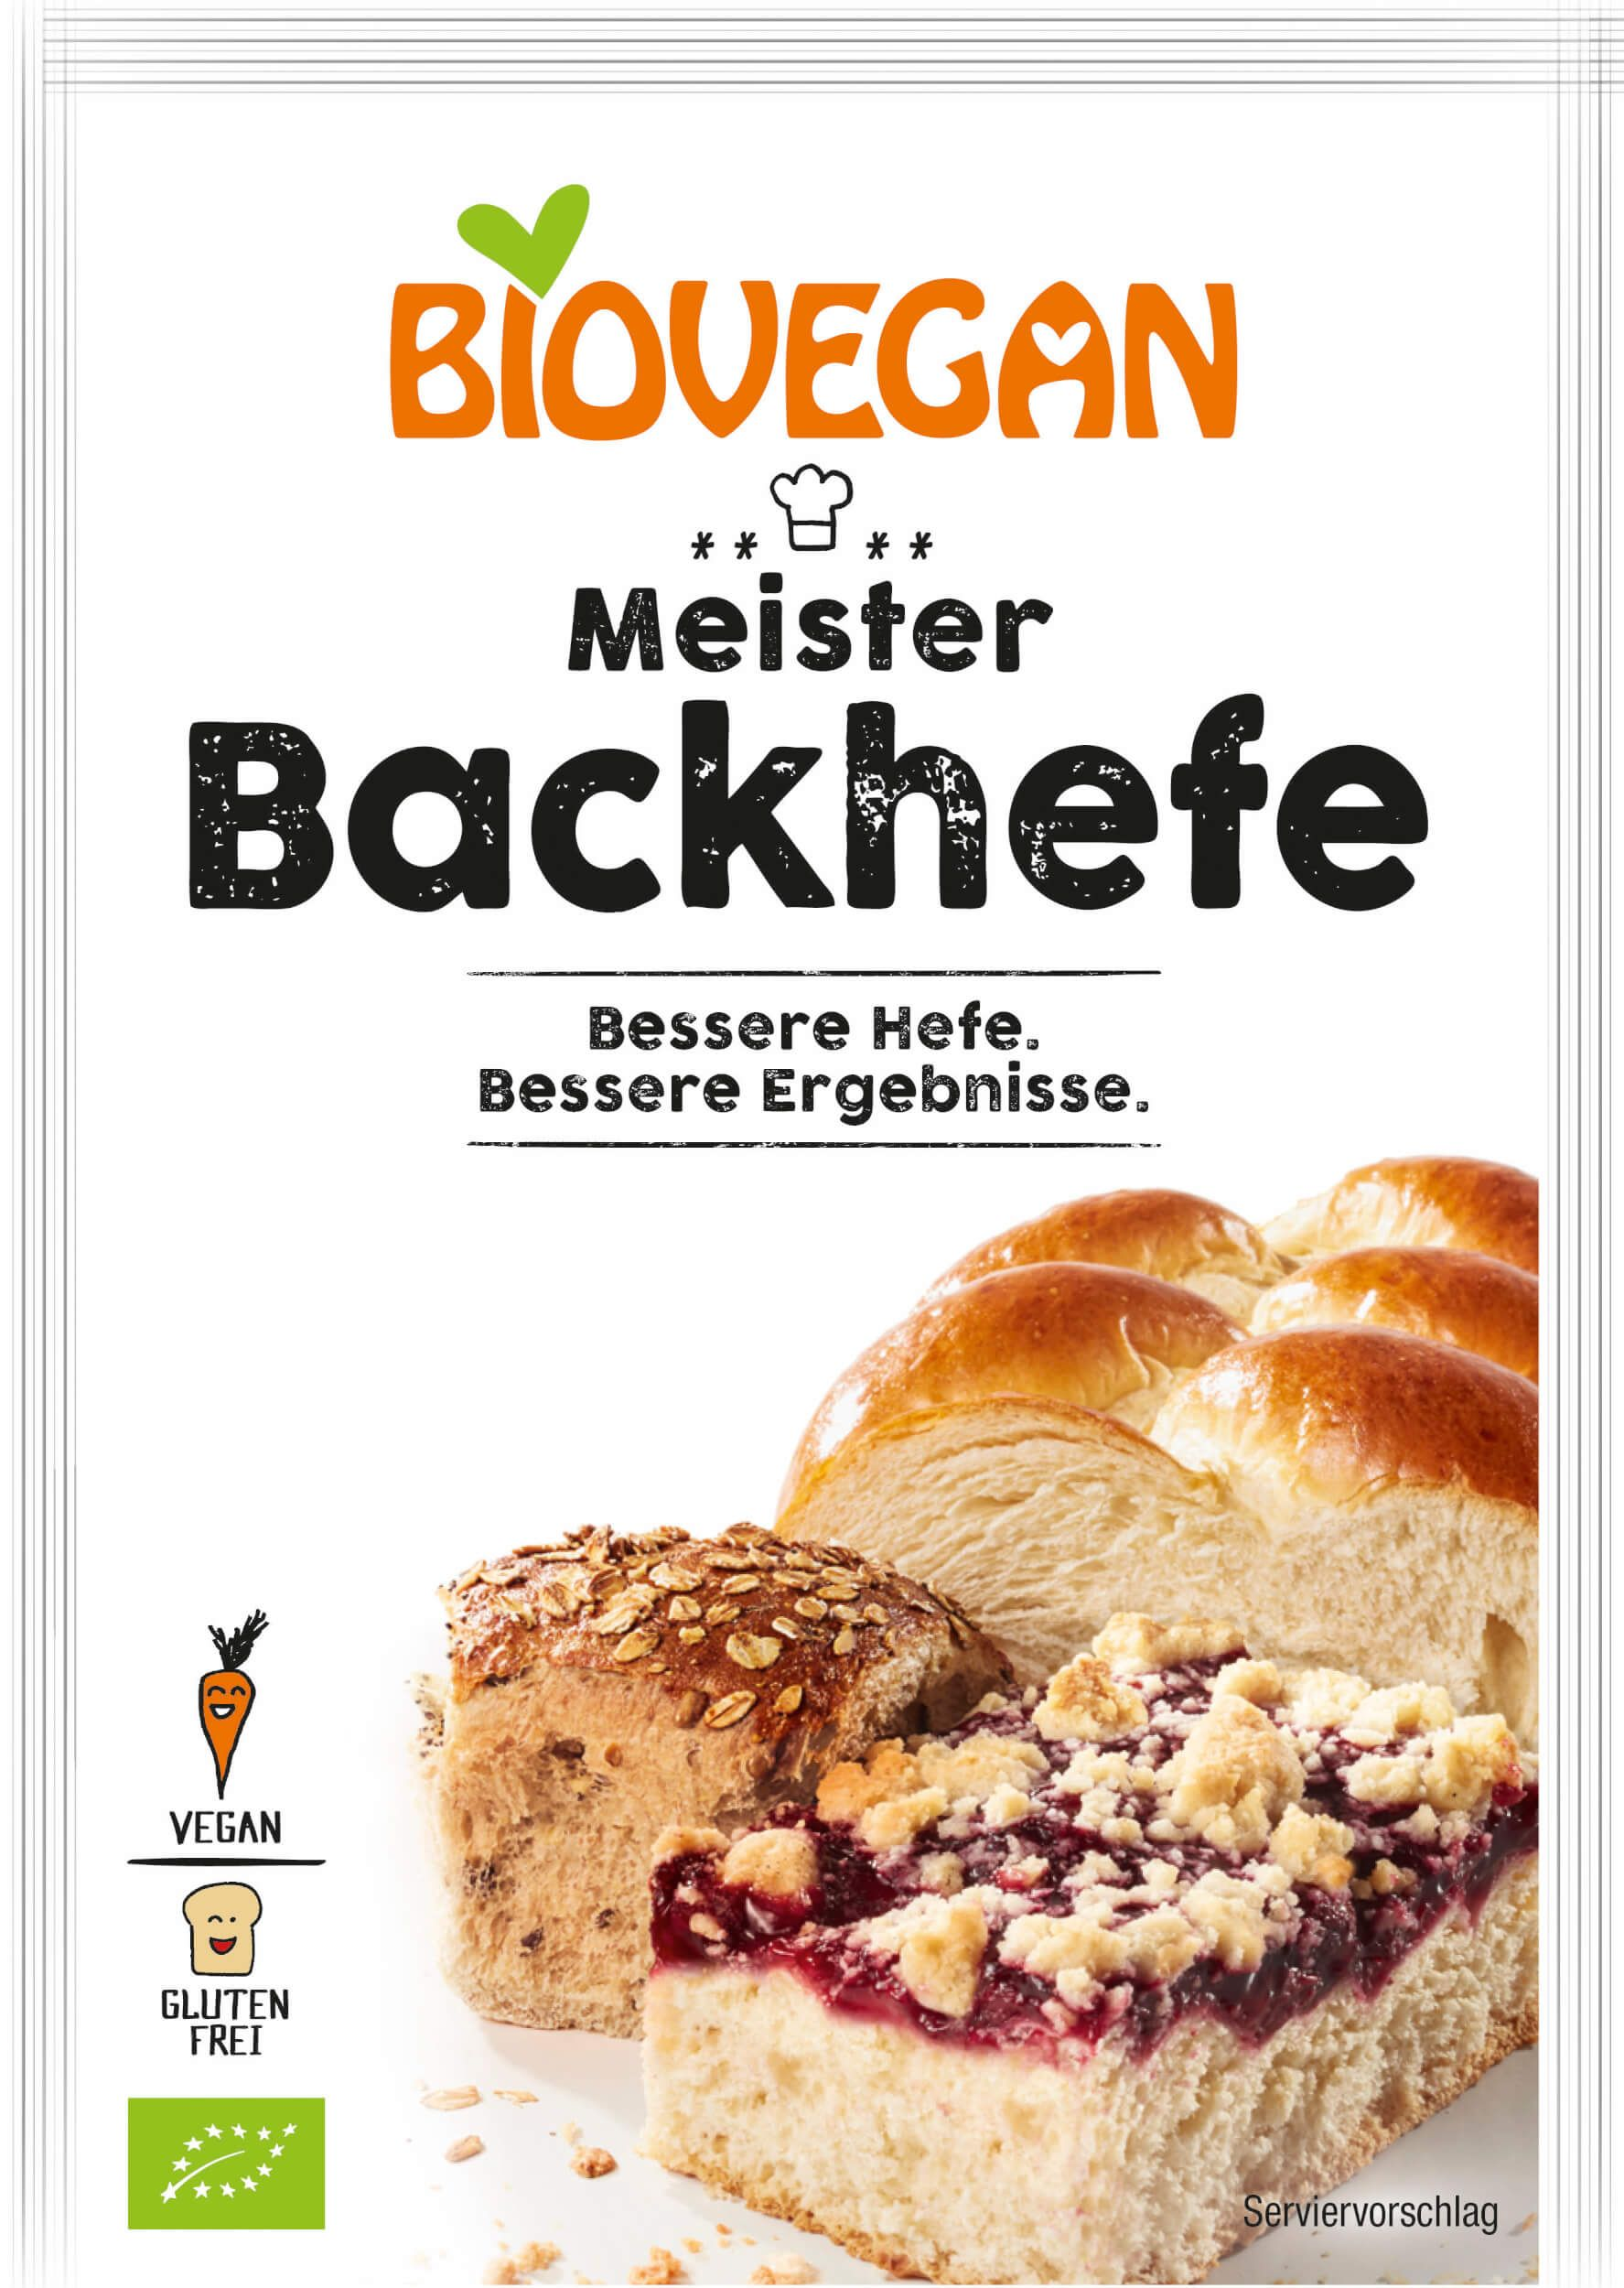 Verpackung Meister Backhefe